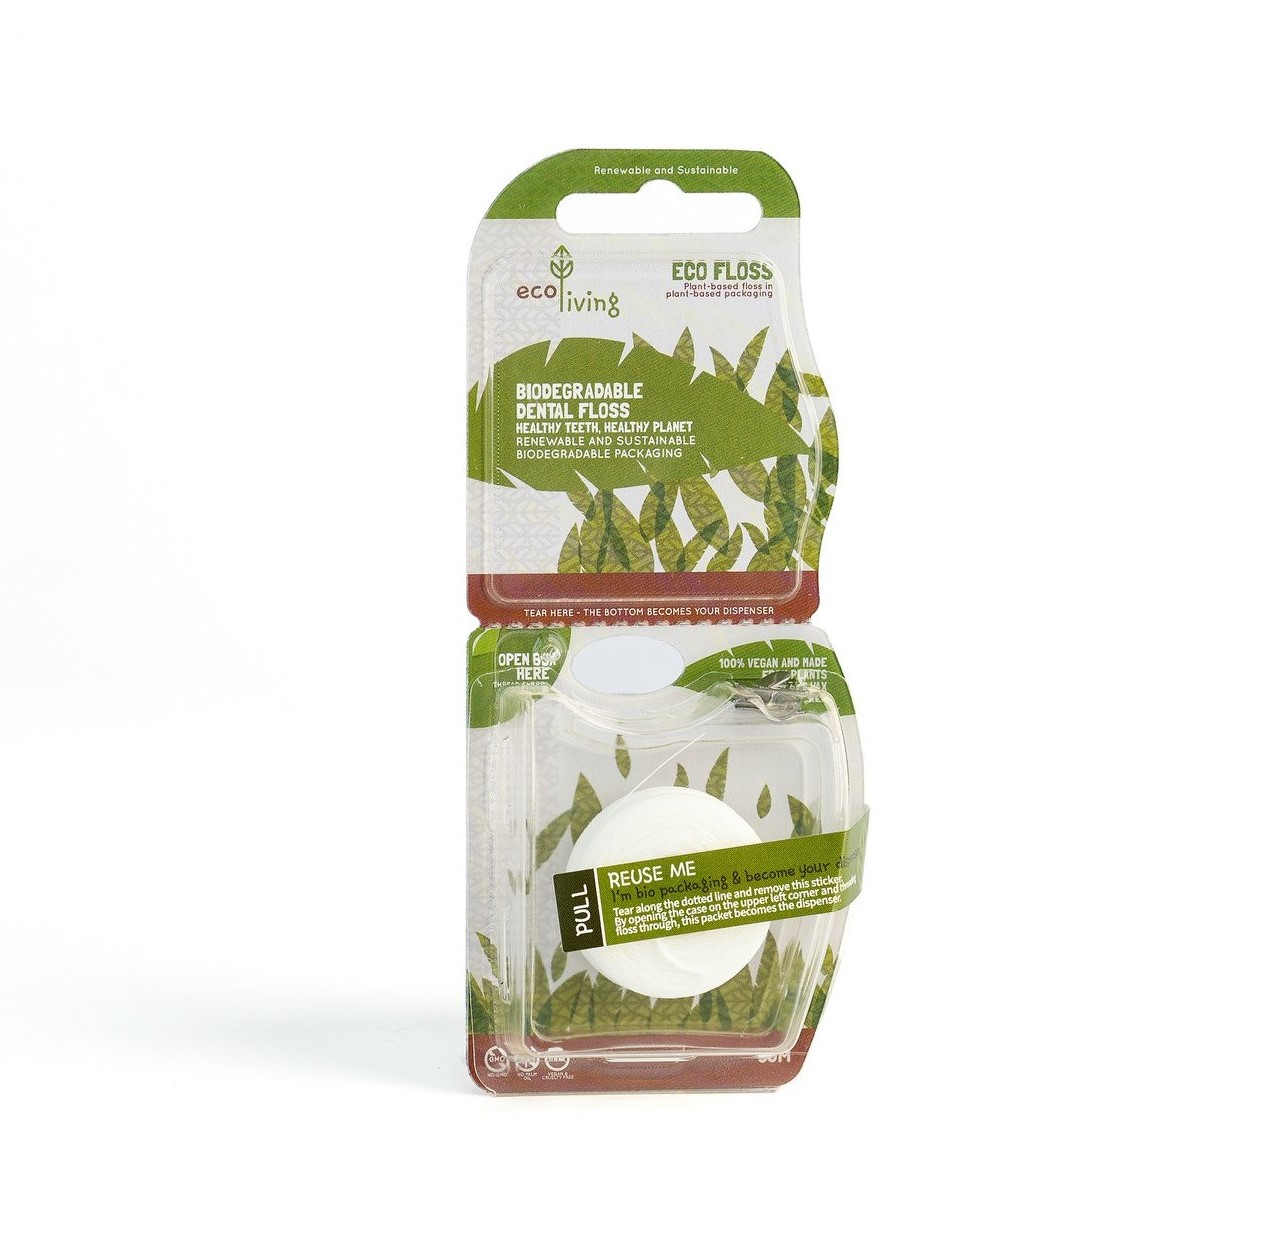 Biodegradable Dental Floss (Single)